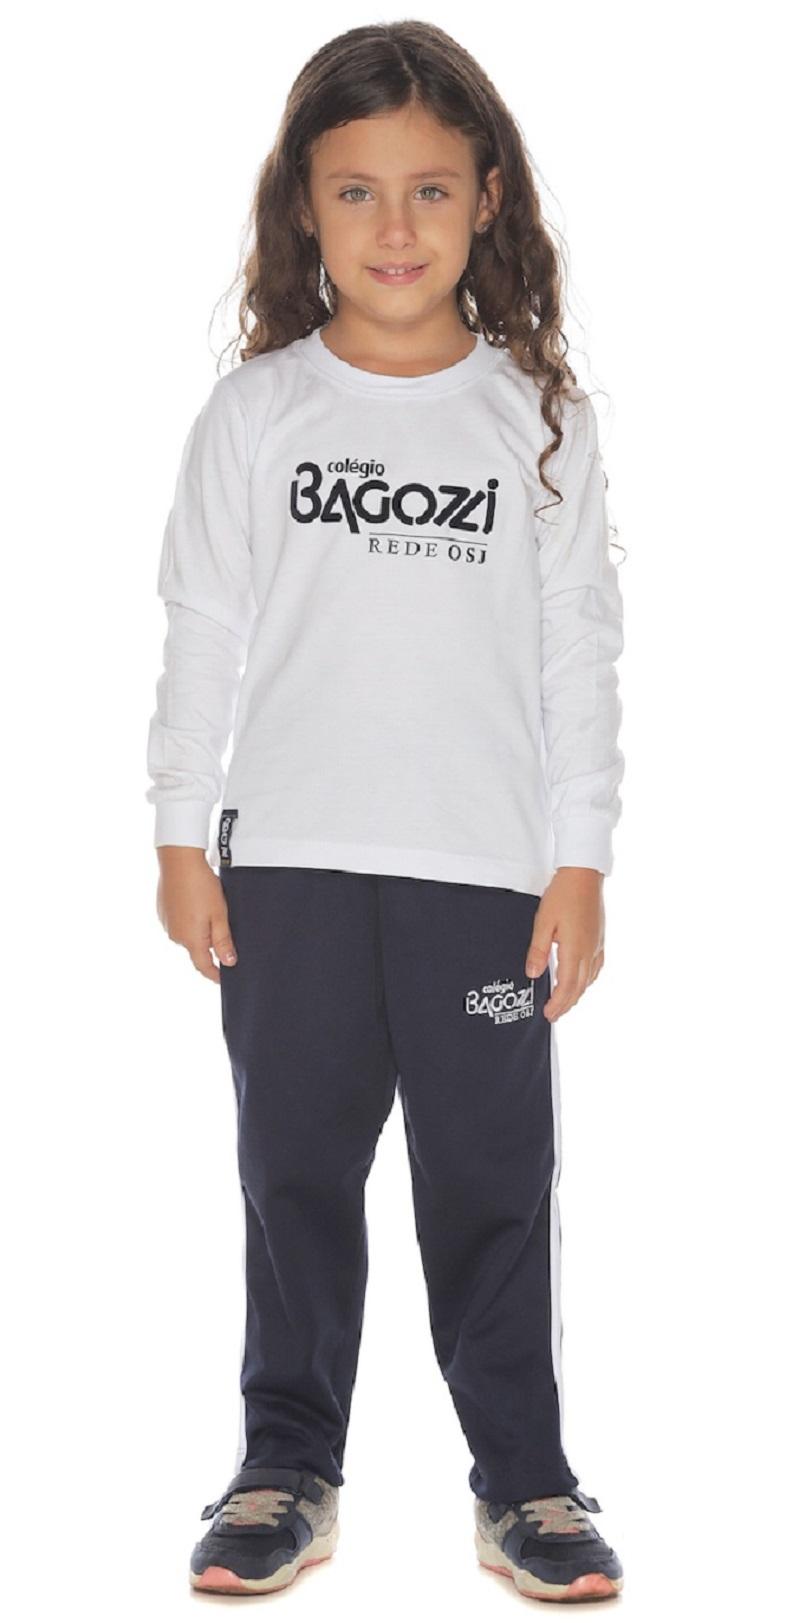 Camiseta Manga Longa Colégio Bagozzi